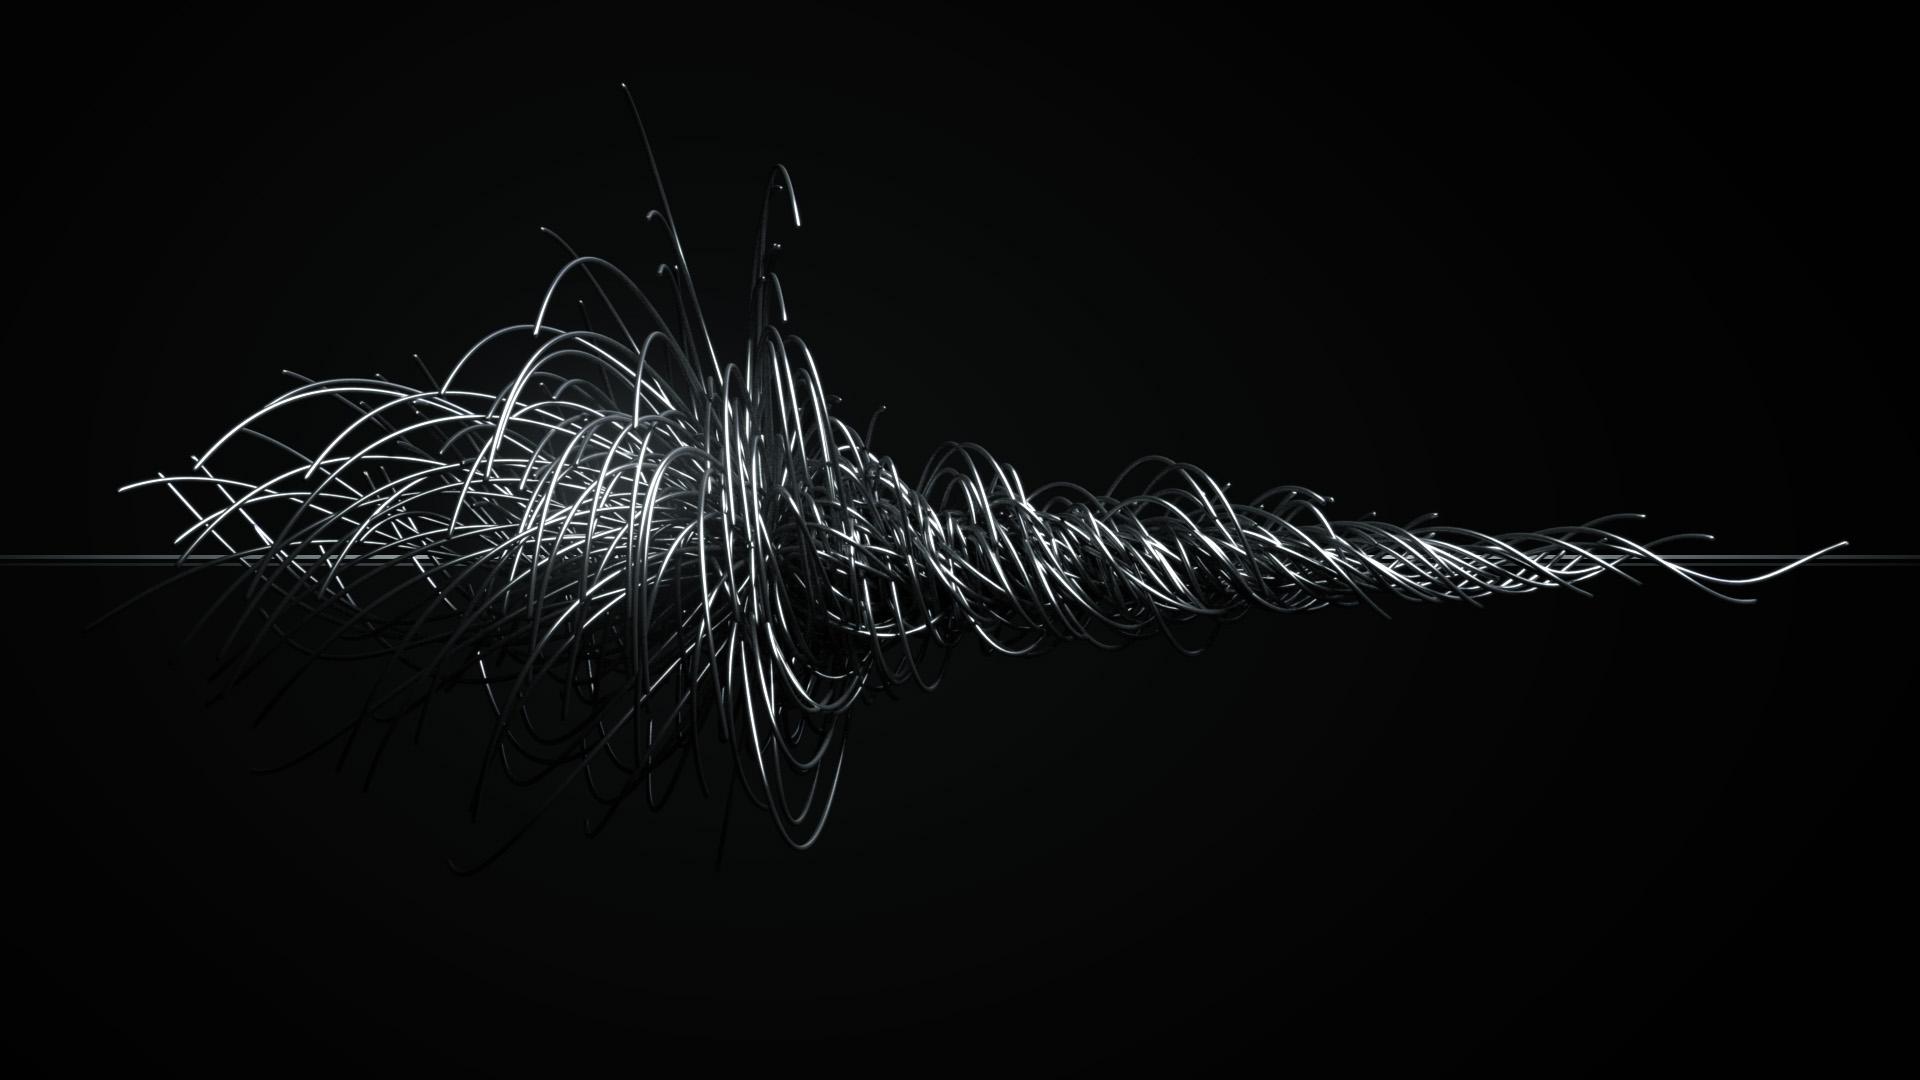 pflow_splines_image02